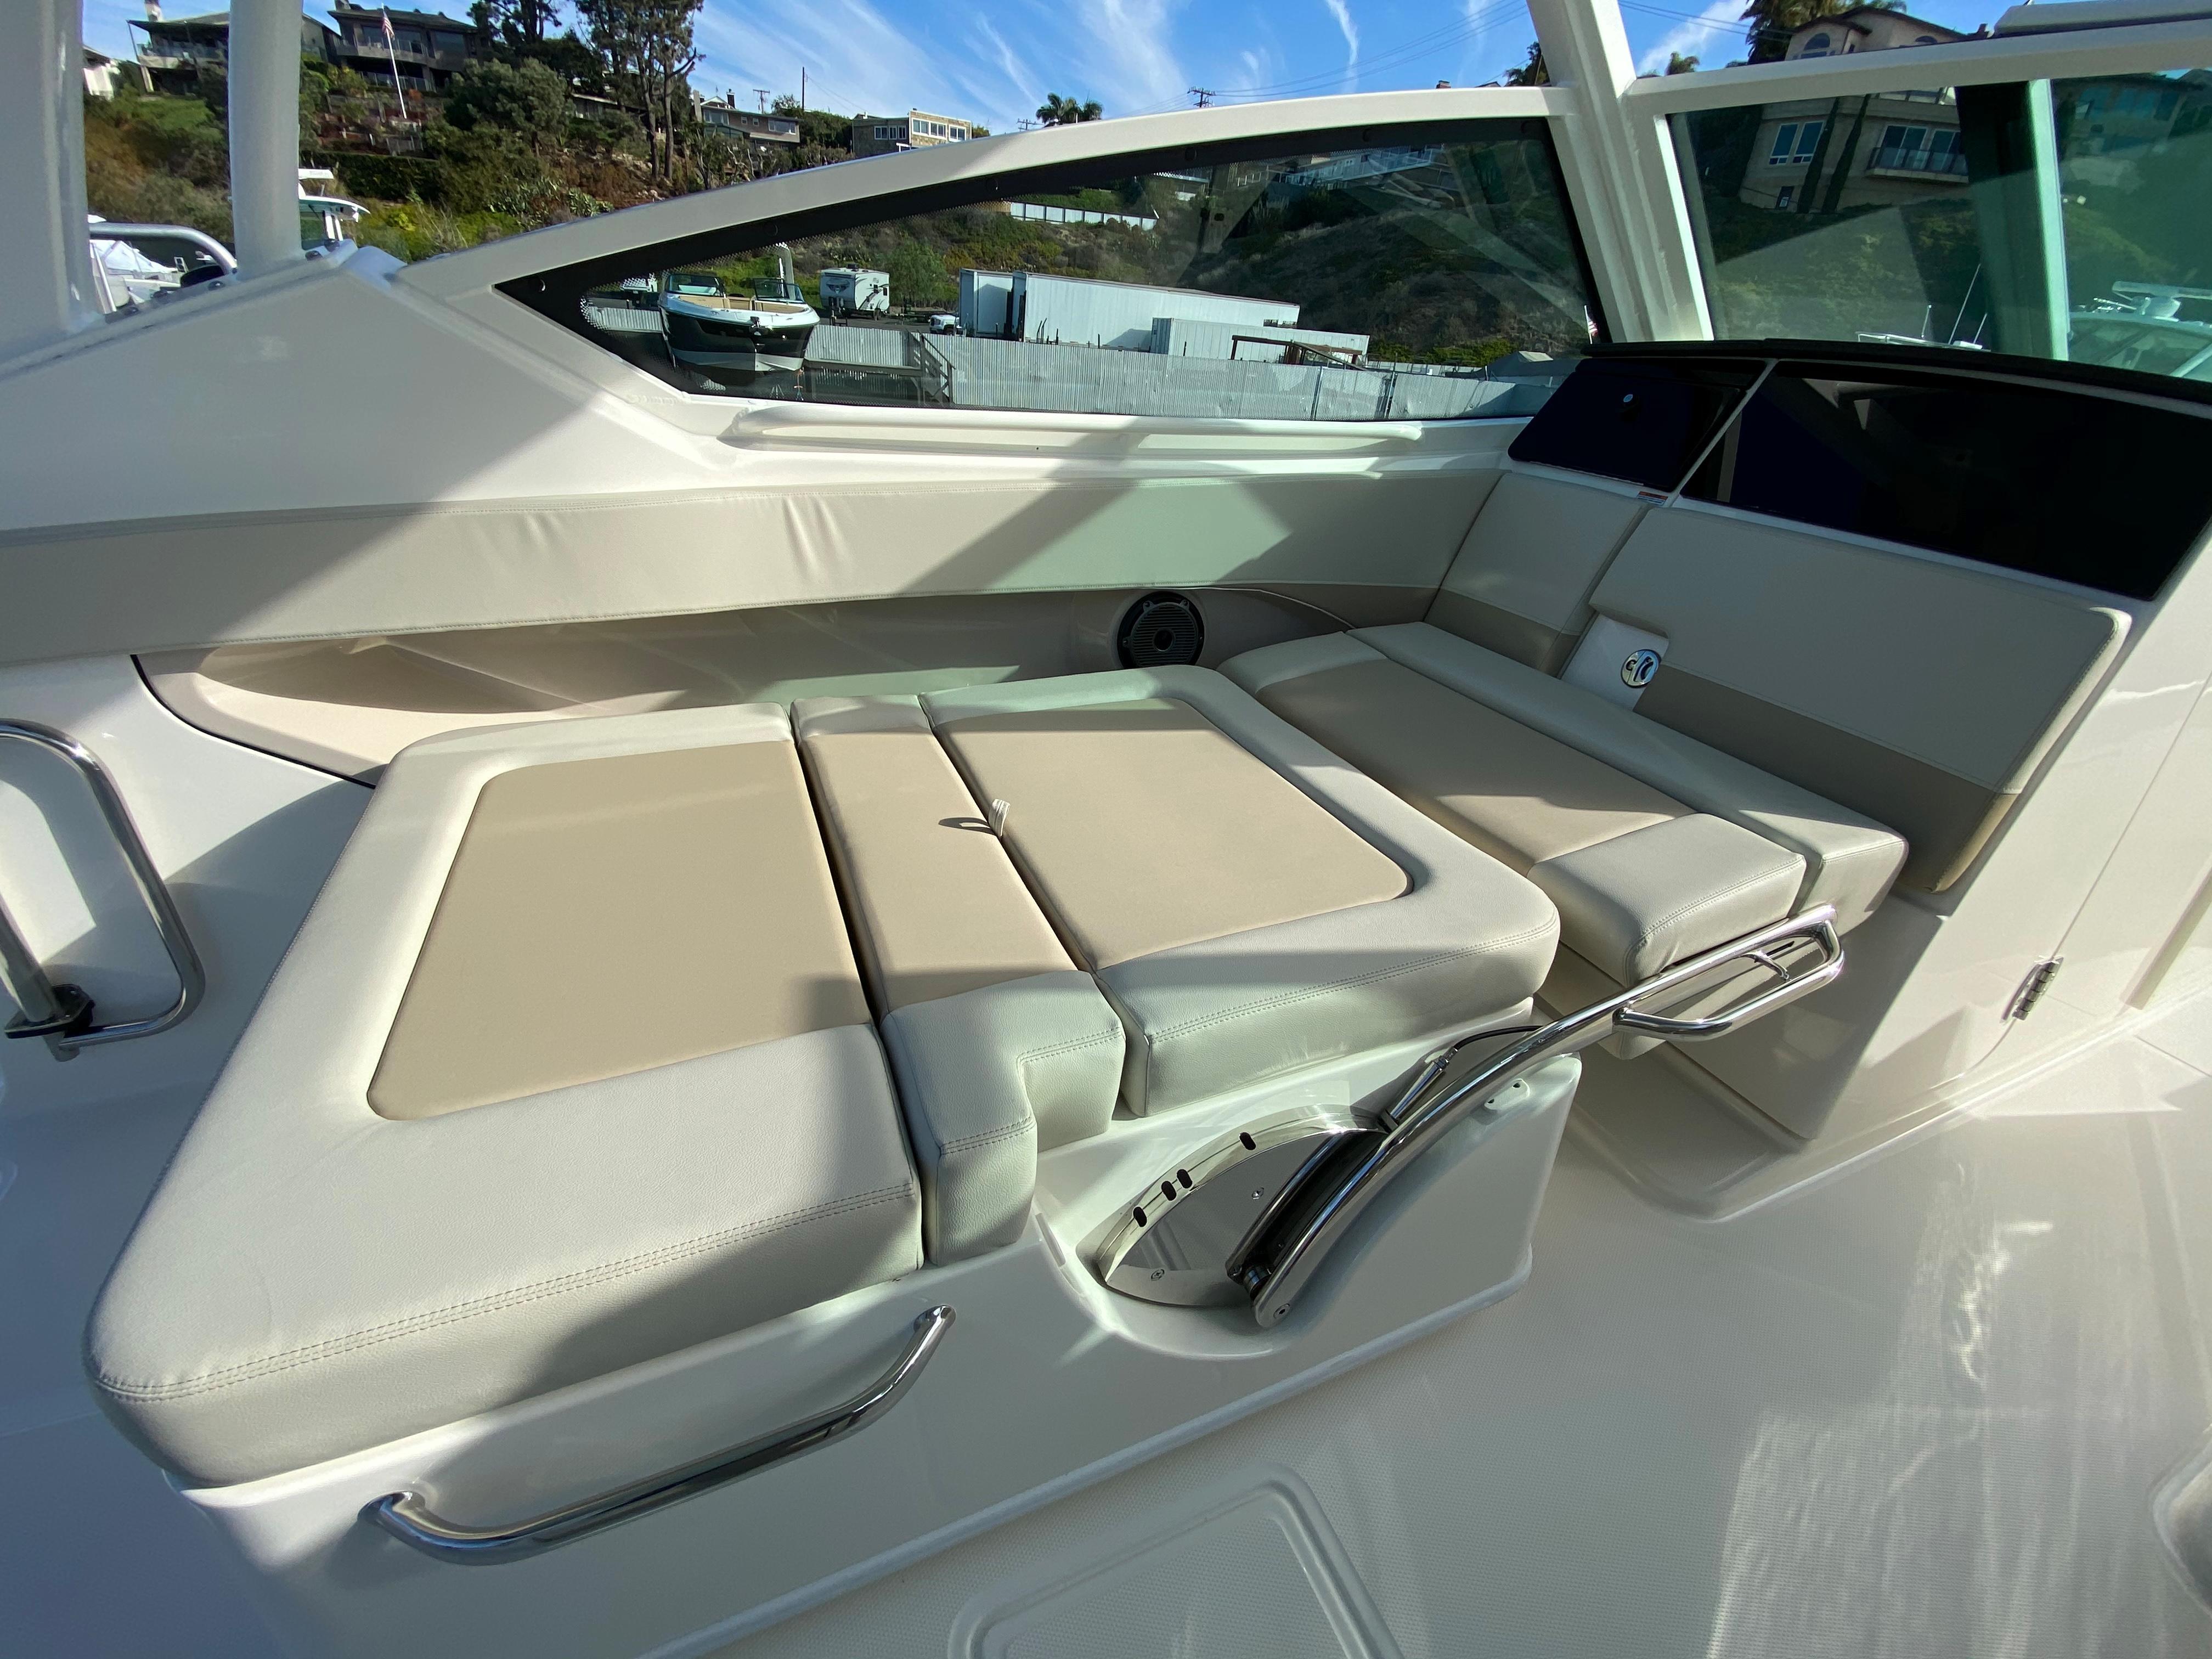 2021 Boston Whaler 280 Vantage #BW0870G inventory image at Sun Country Coastal in Newport Beach